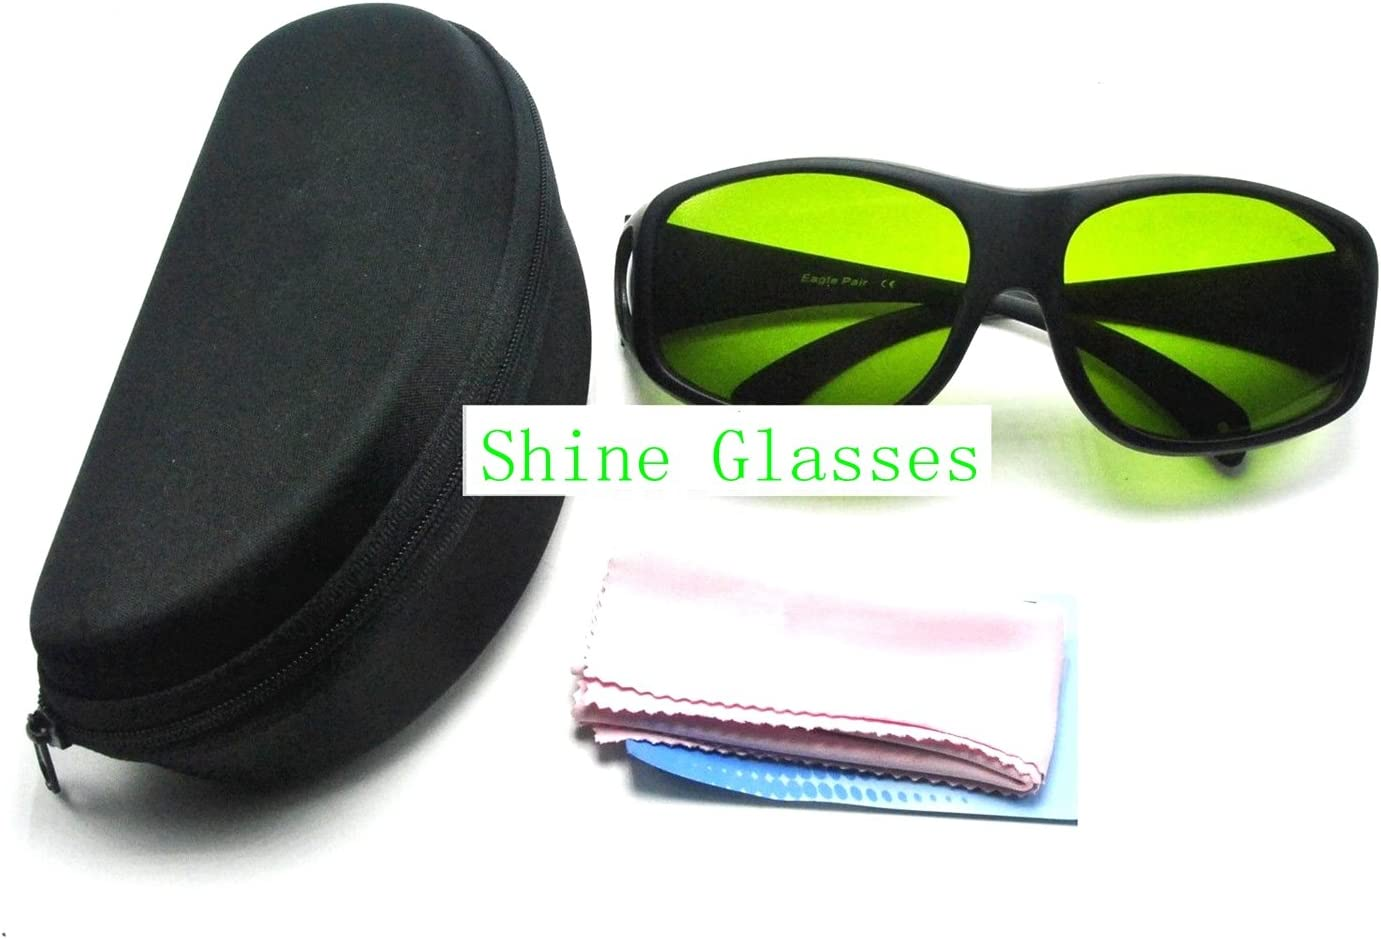 B071FQ3HP4 405nm 450nm 808nm 850nm 980nm 1064nm Laser Protective Goggles OD5+ Safety Glasses 7164mZDkWlL.SL1500_